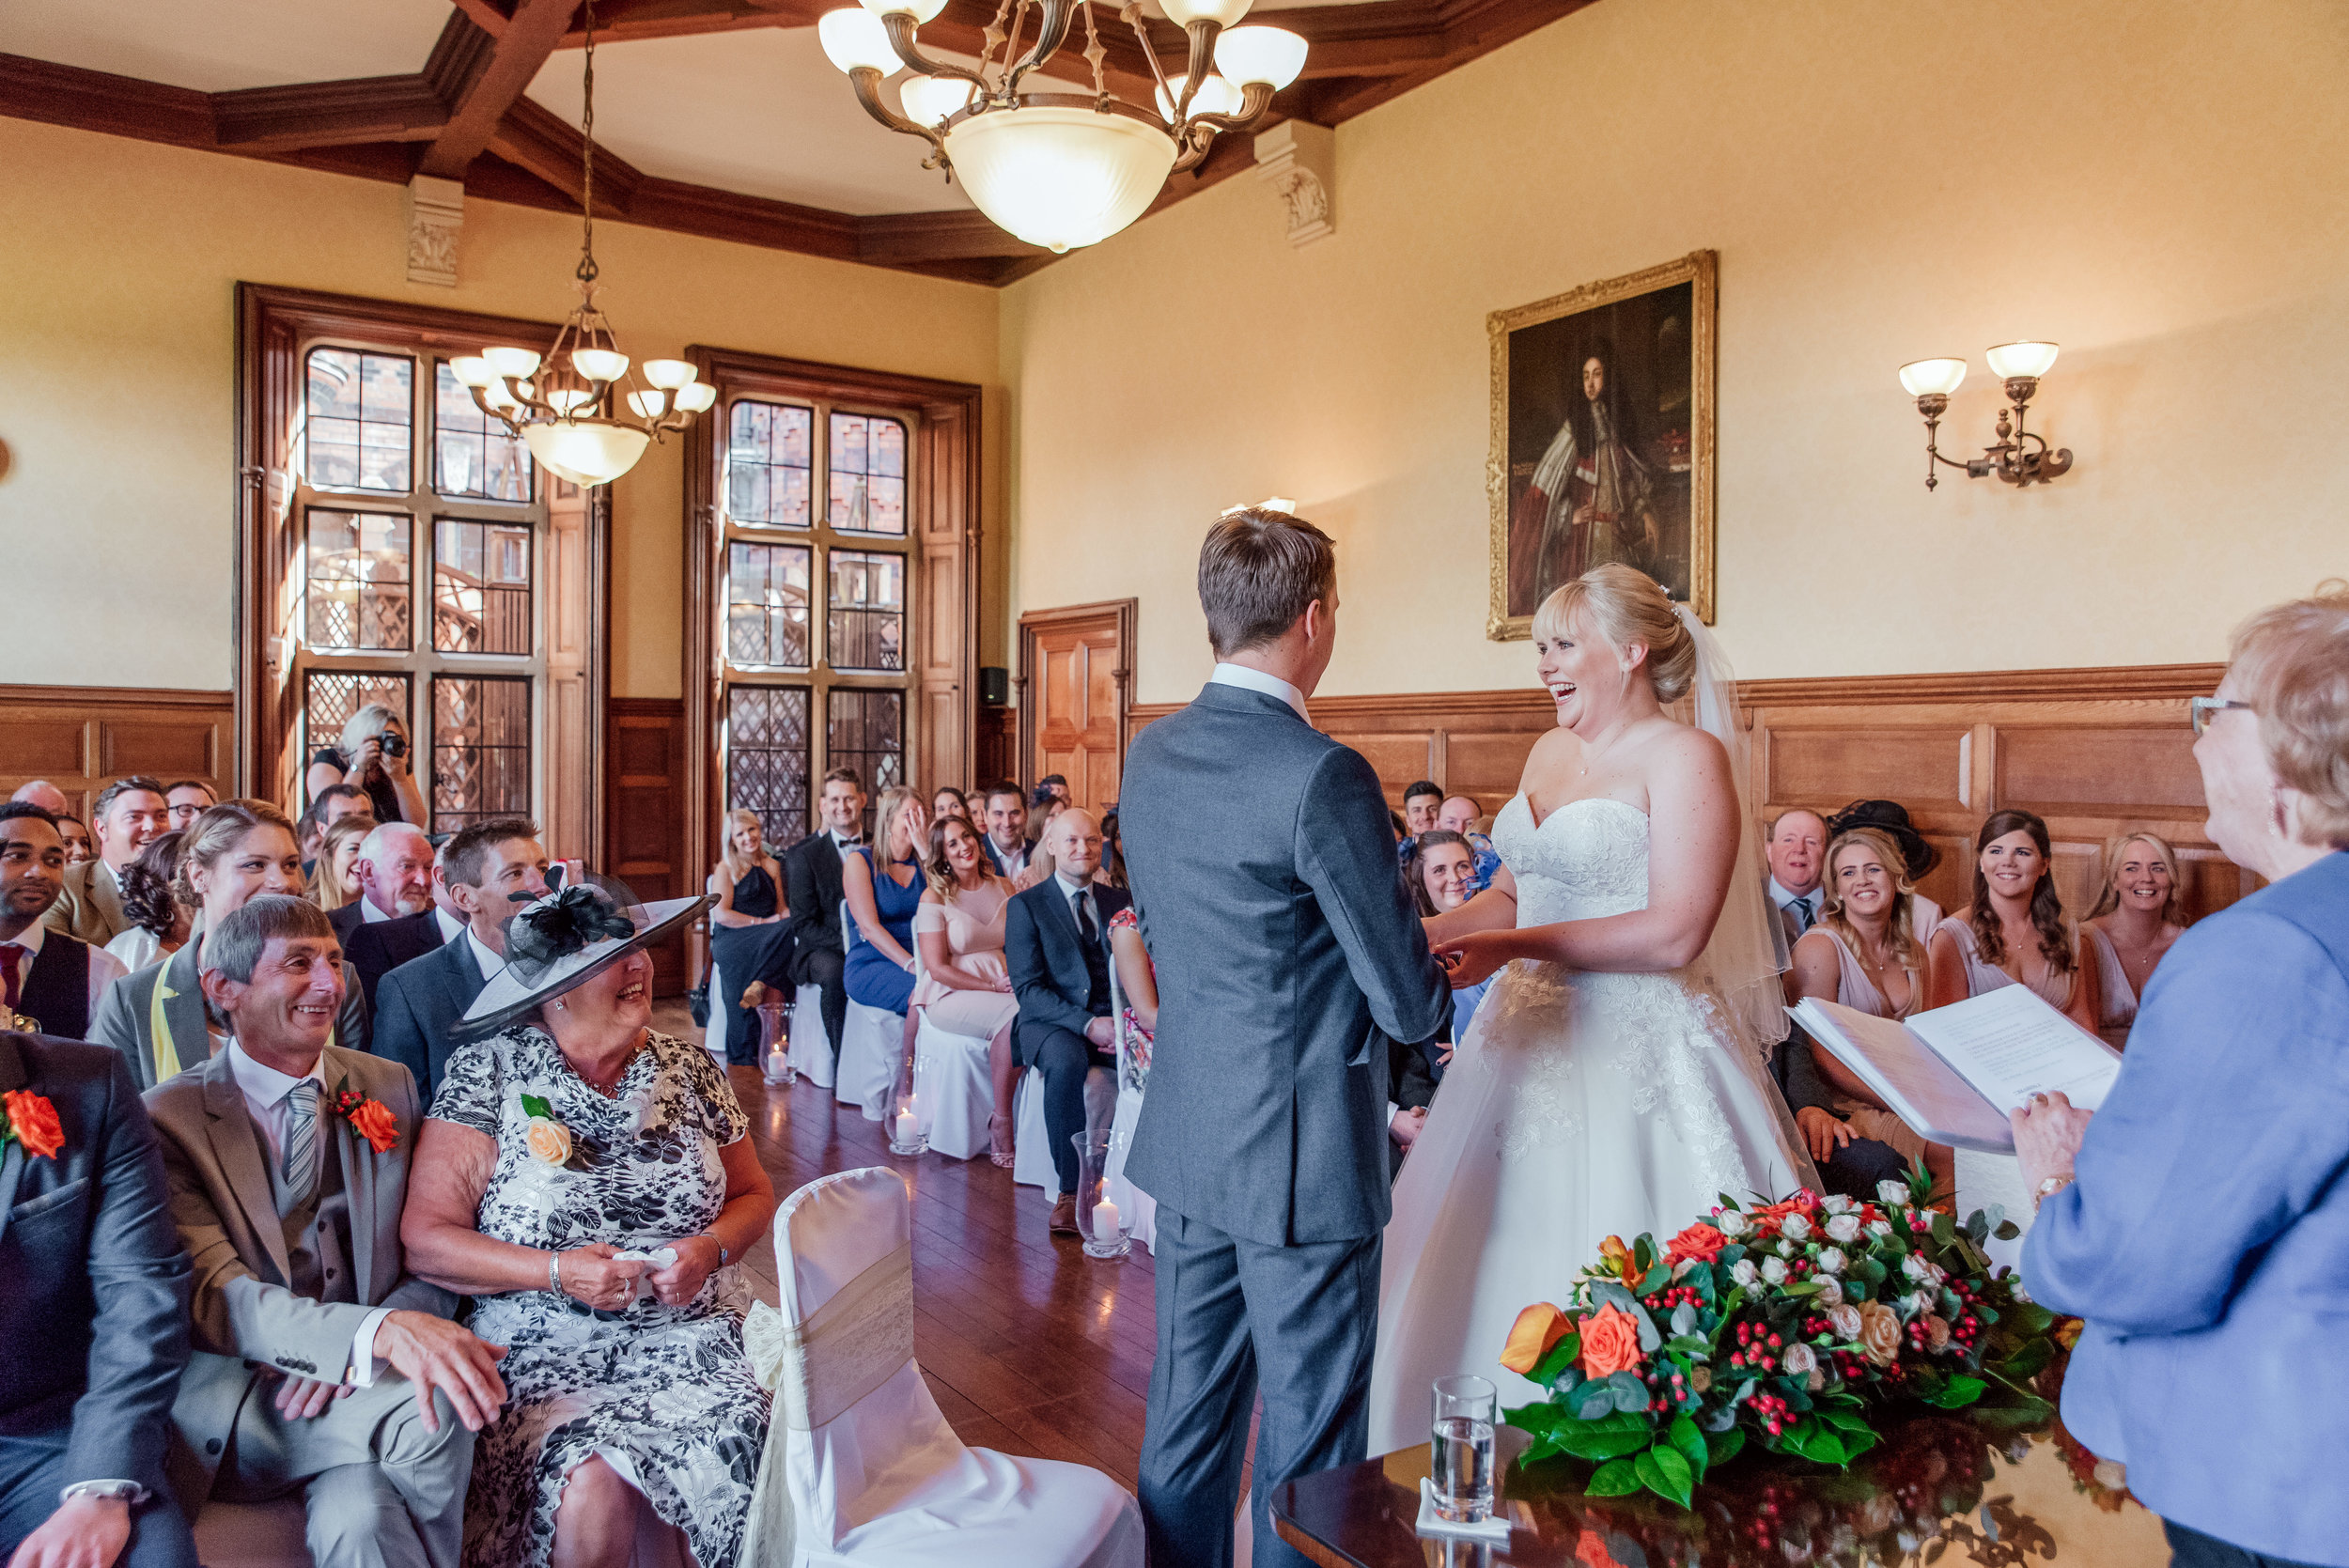 Bride and Groom at The Elvetham Wedding Venue - Amy James Photography - Wedding Photographer Hampshire